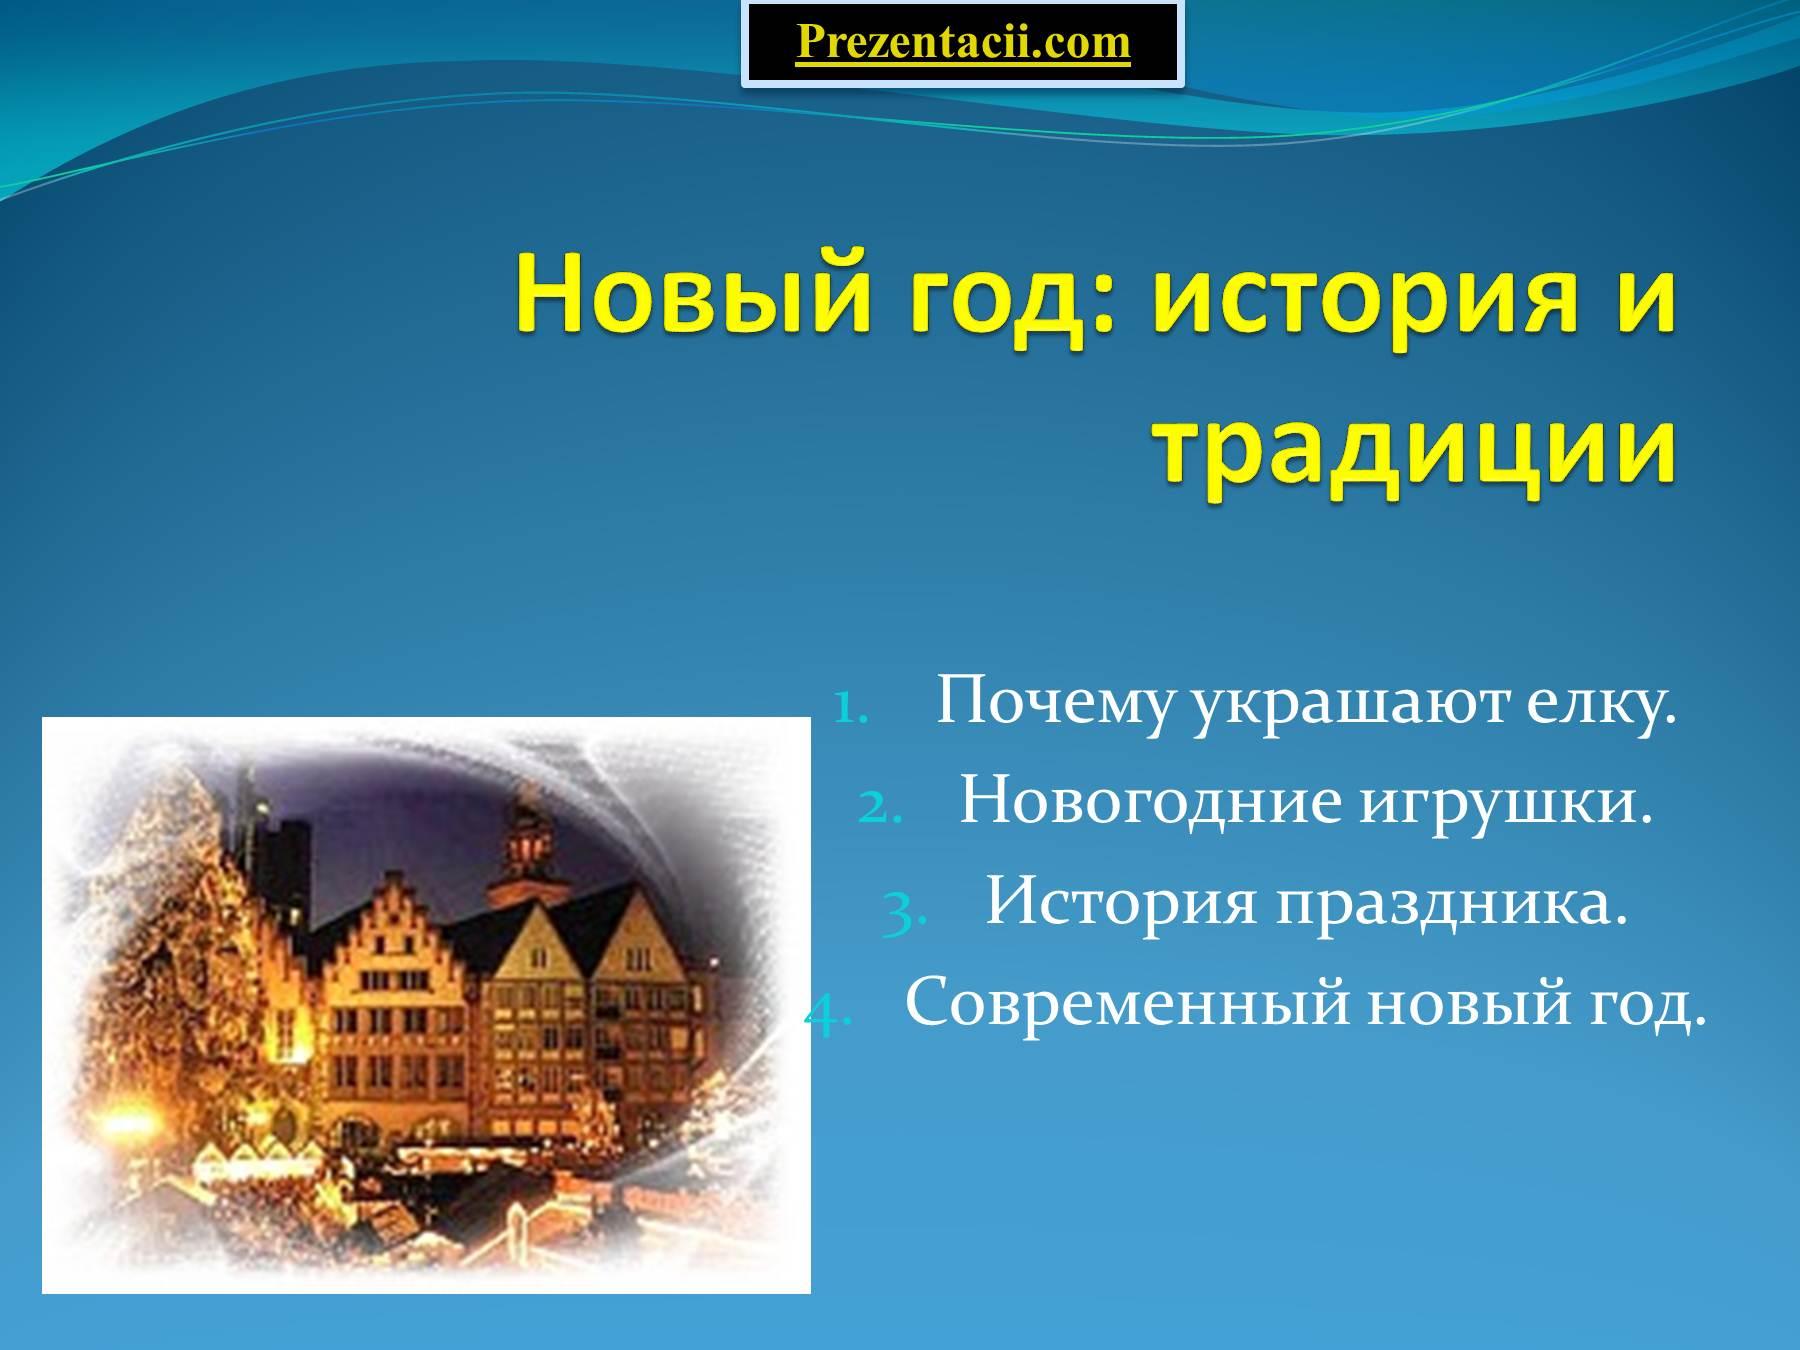 Презентация на тему новый год картинки